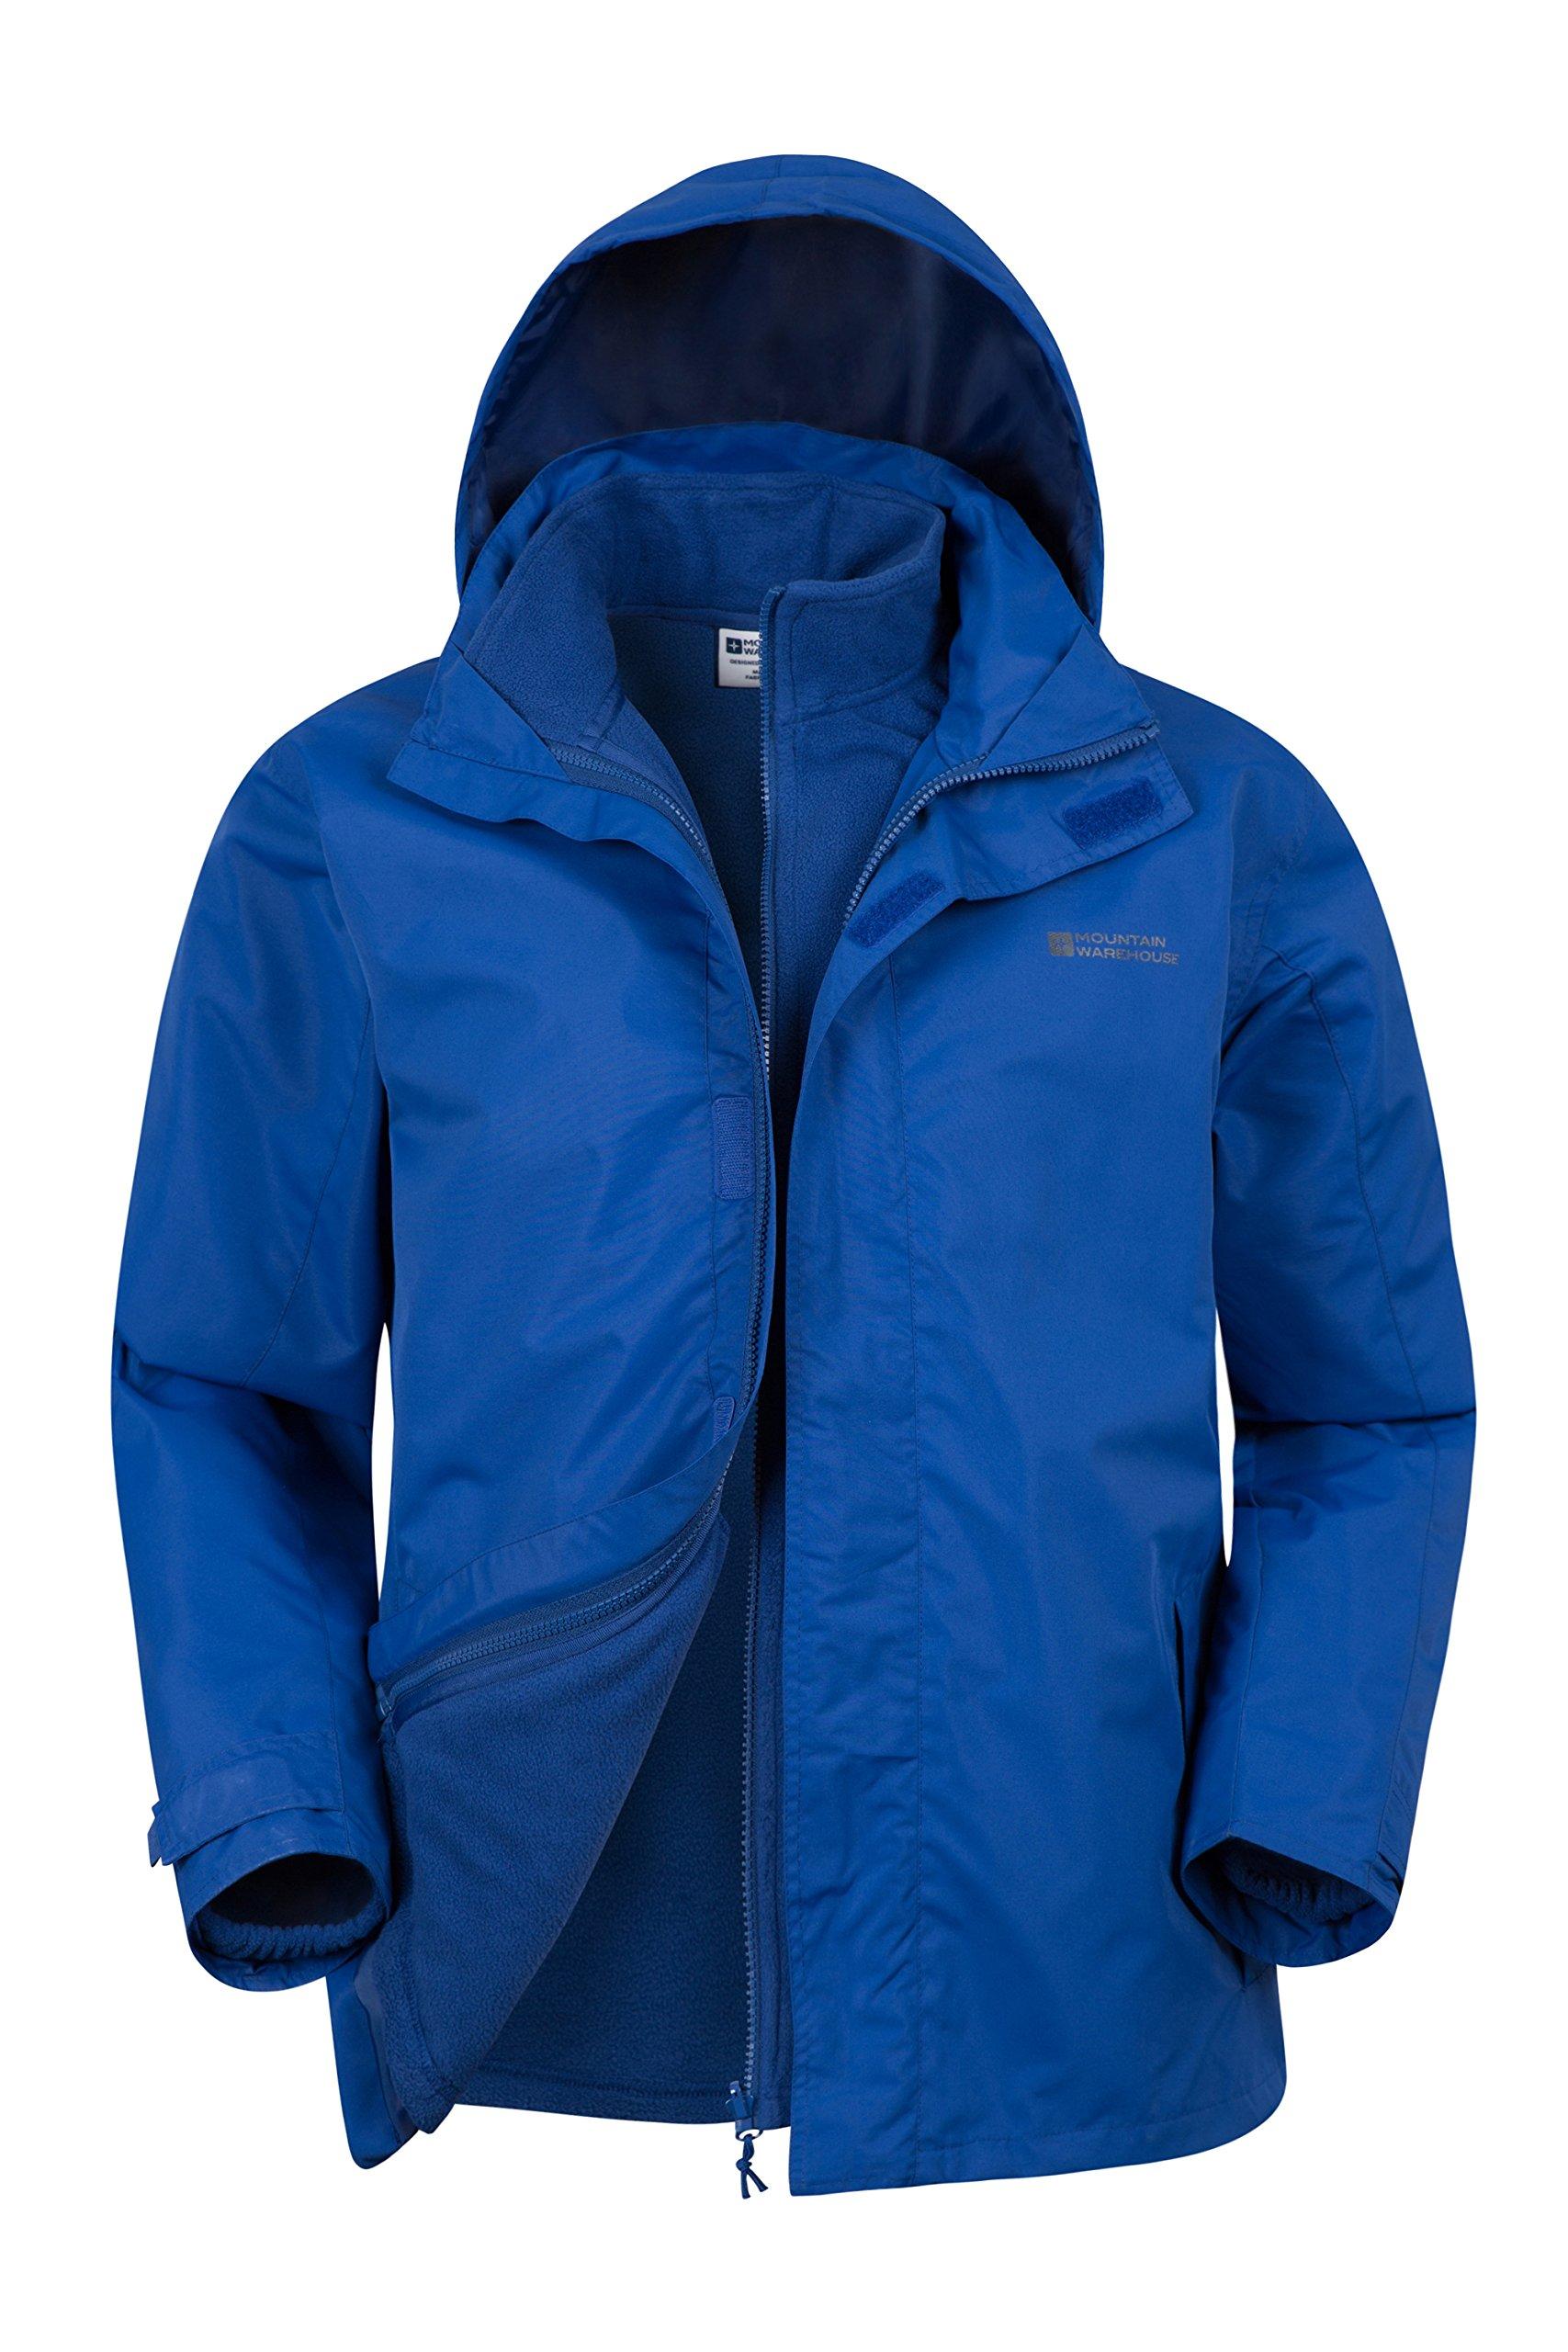 Mountain Warehouse Fell Mens 3 in 1 Water Resistant Jacket – Adjustable Hood Mens Coat, Detachable Inner Fleece Rain…